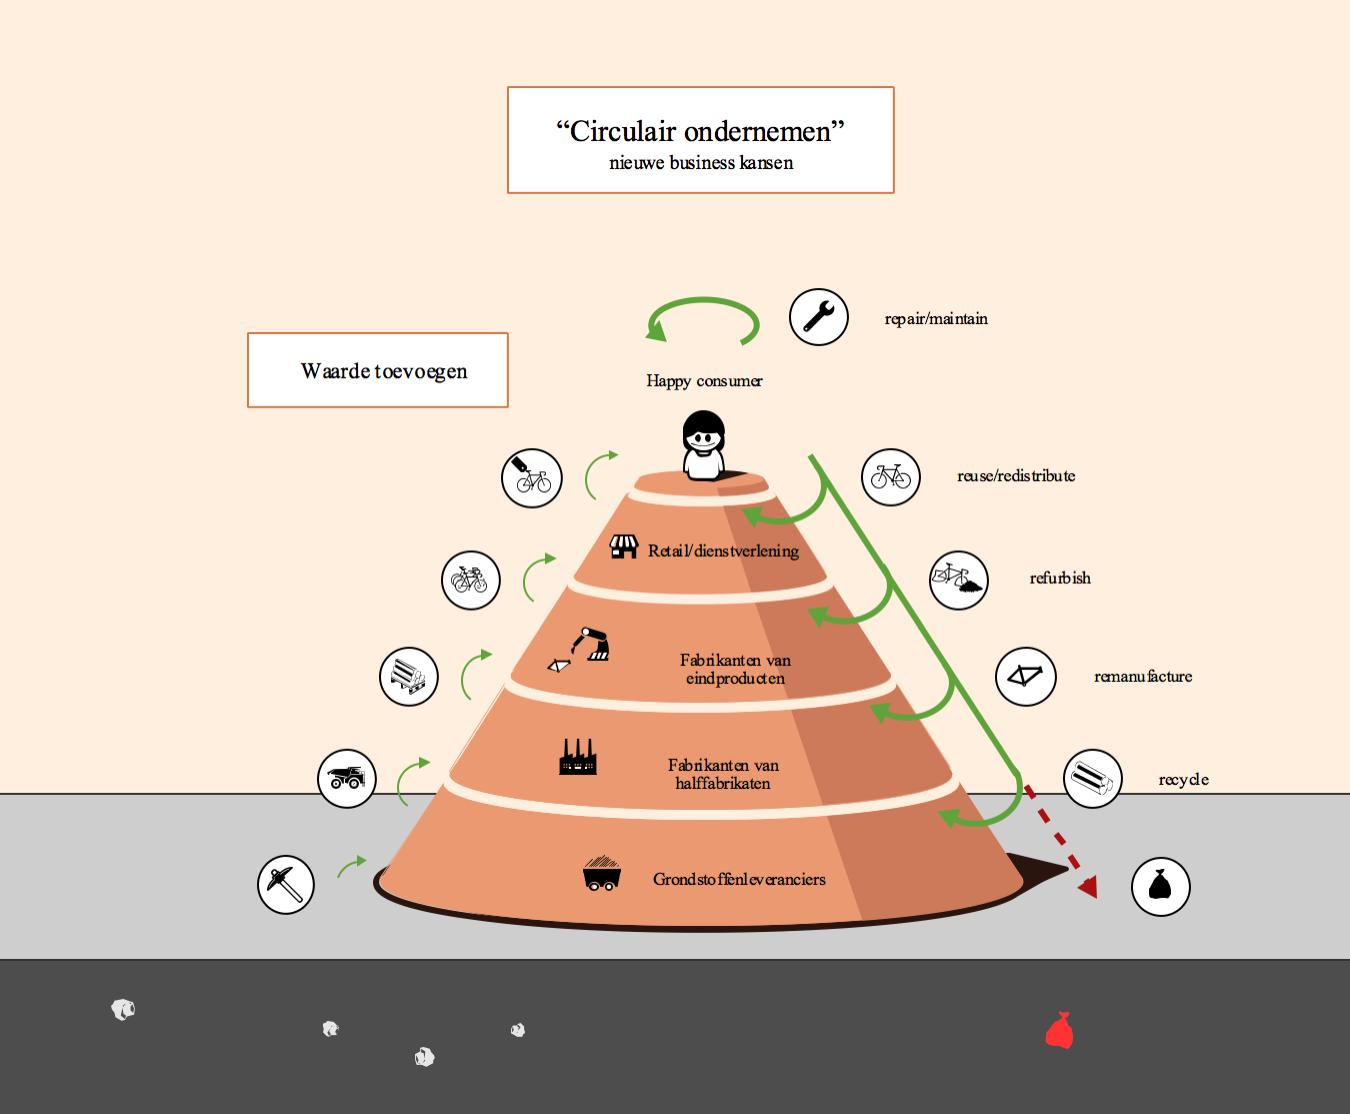 Value Hill model (Circo)